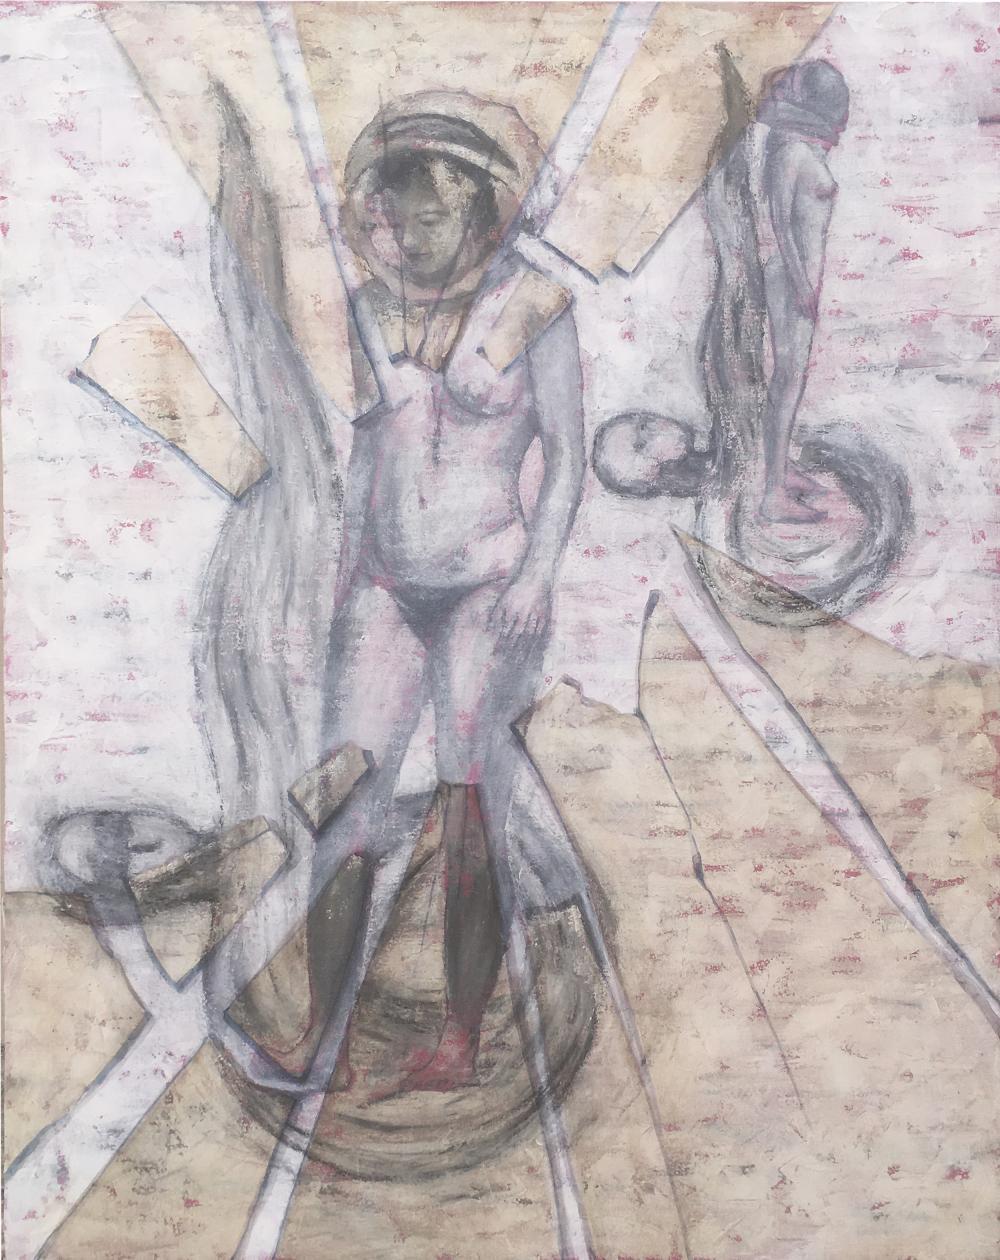 Serie Cuadros rotos. Carne cósmica. 100x81. Acrílico sobre lienzo. (2018) - Enrique Demetrio